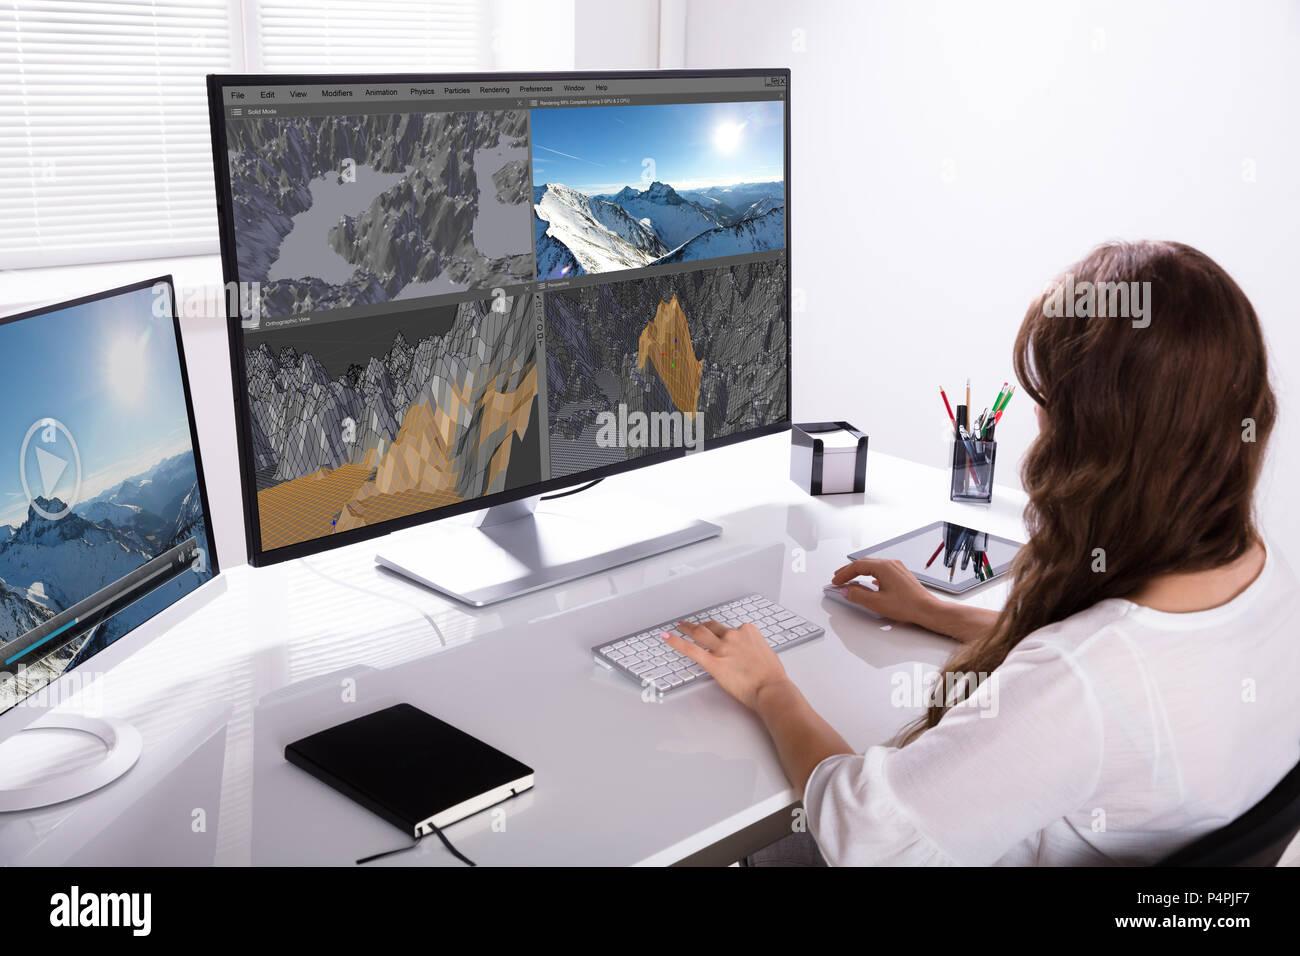 Rückansicht einer Frau Arbeiten an 3D-Landschaft auf dem Computer im Büro Stockbild